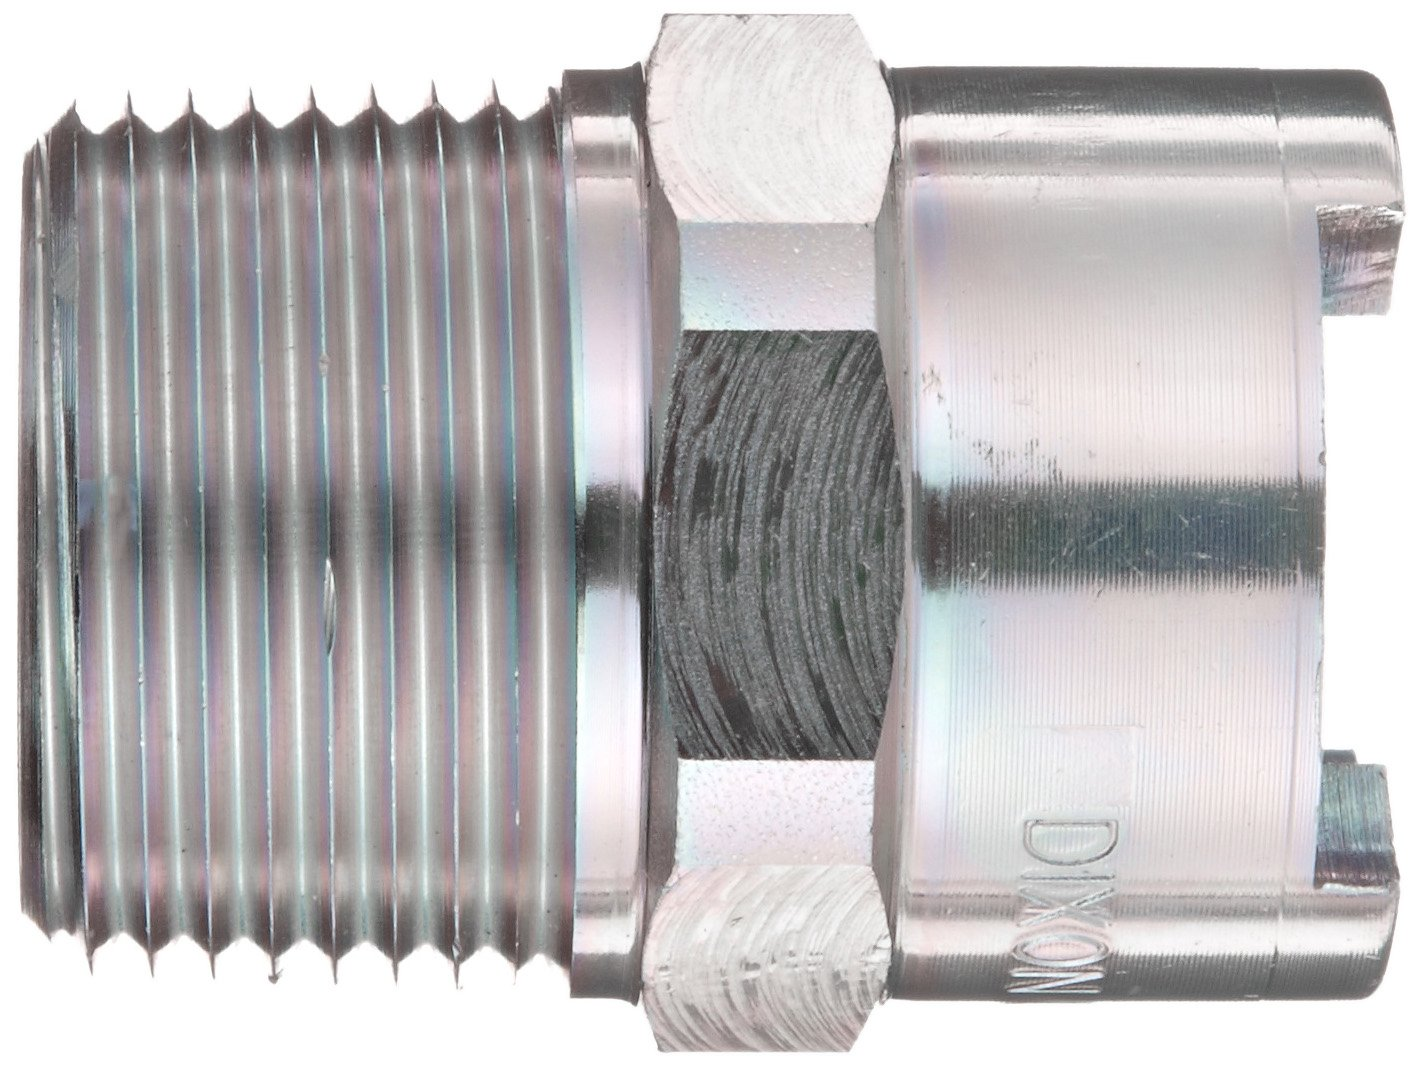 Dixon QM65 Plated Steel Dix-Lock Quick Acting Air Hose Fitting 1//2 Female Head x 1 NPT Male